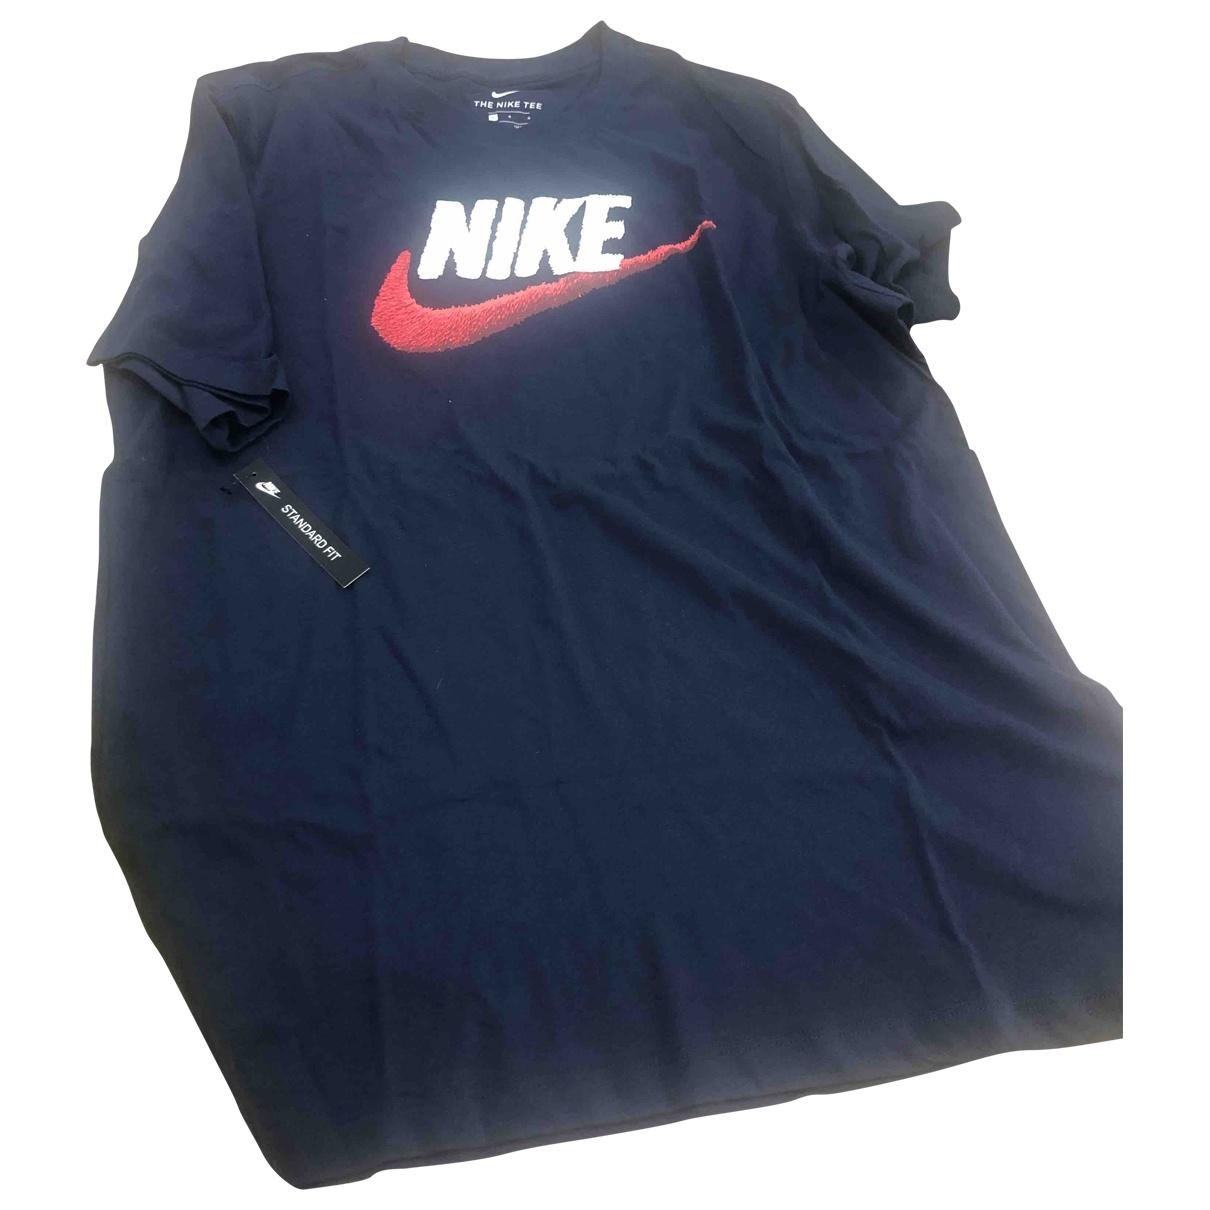 Nike - Tee shirts   pour homme en coton - bleu